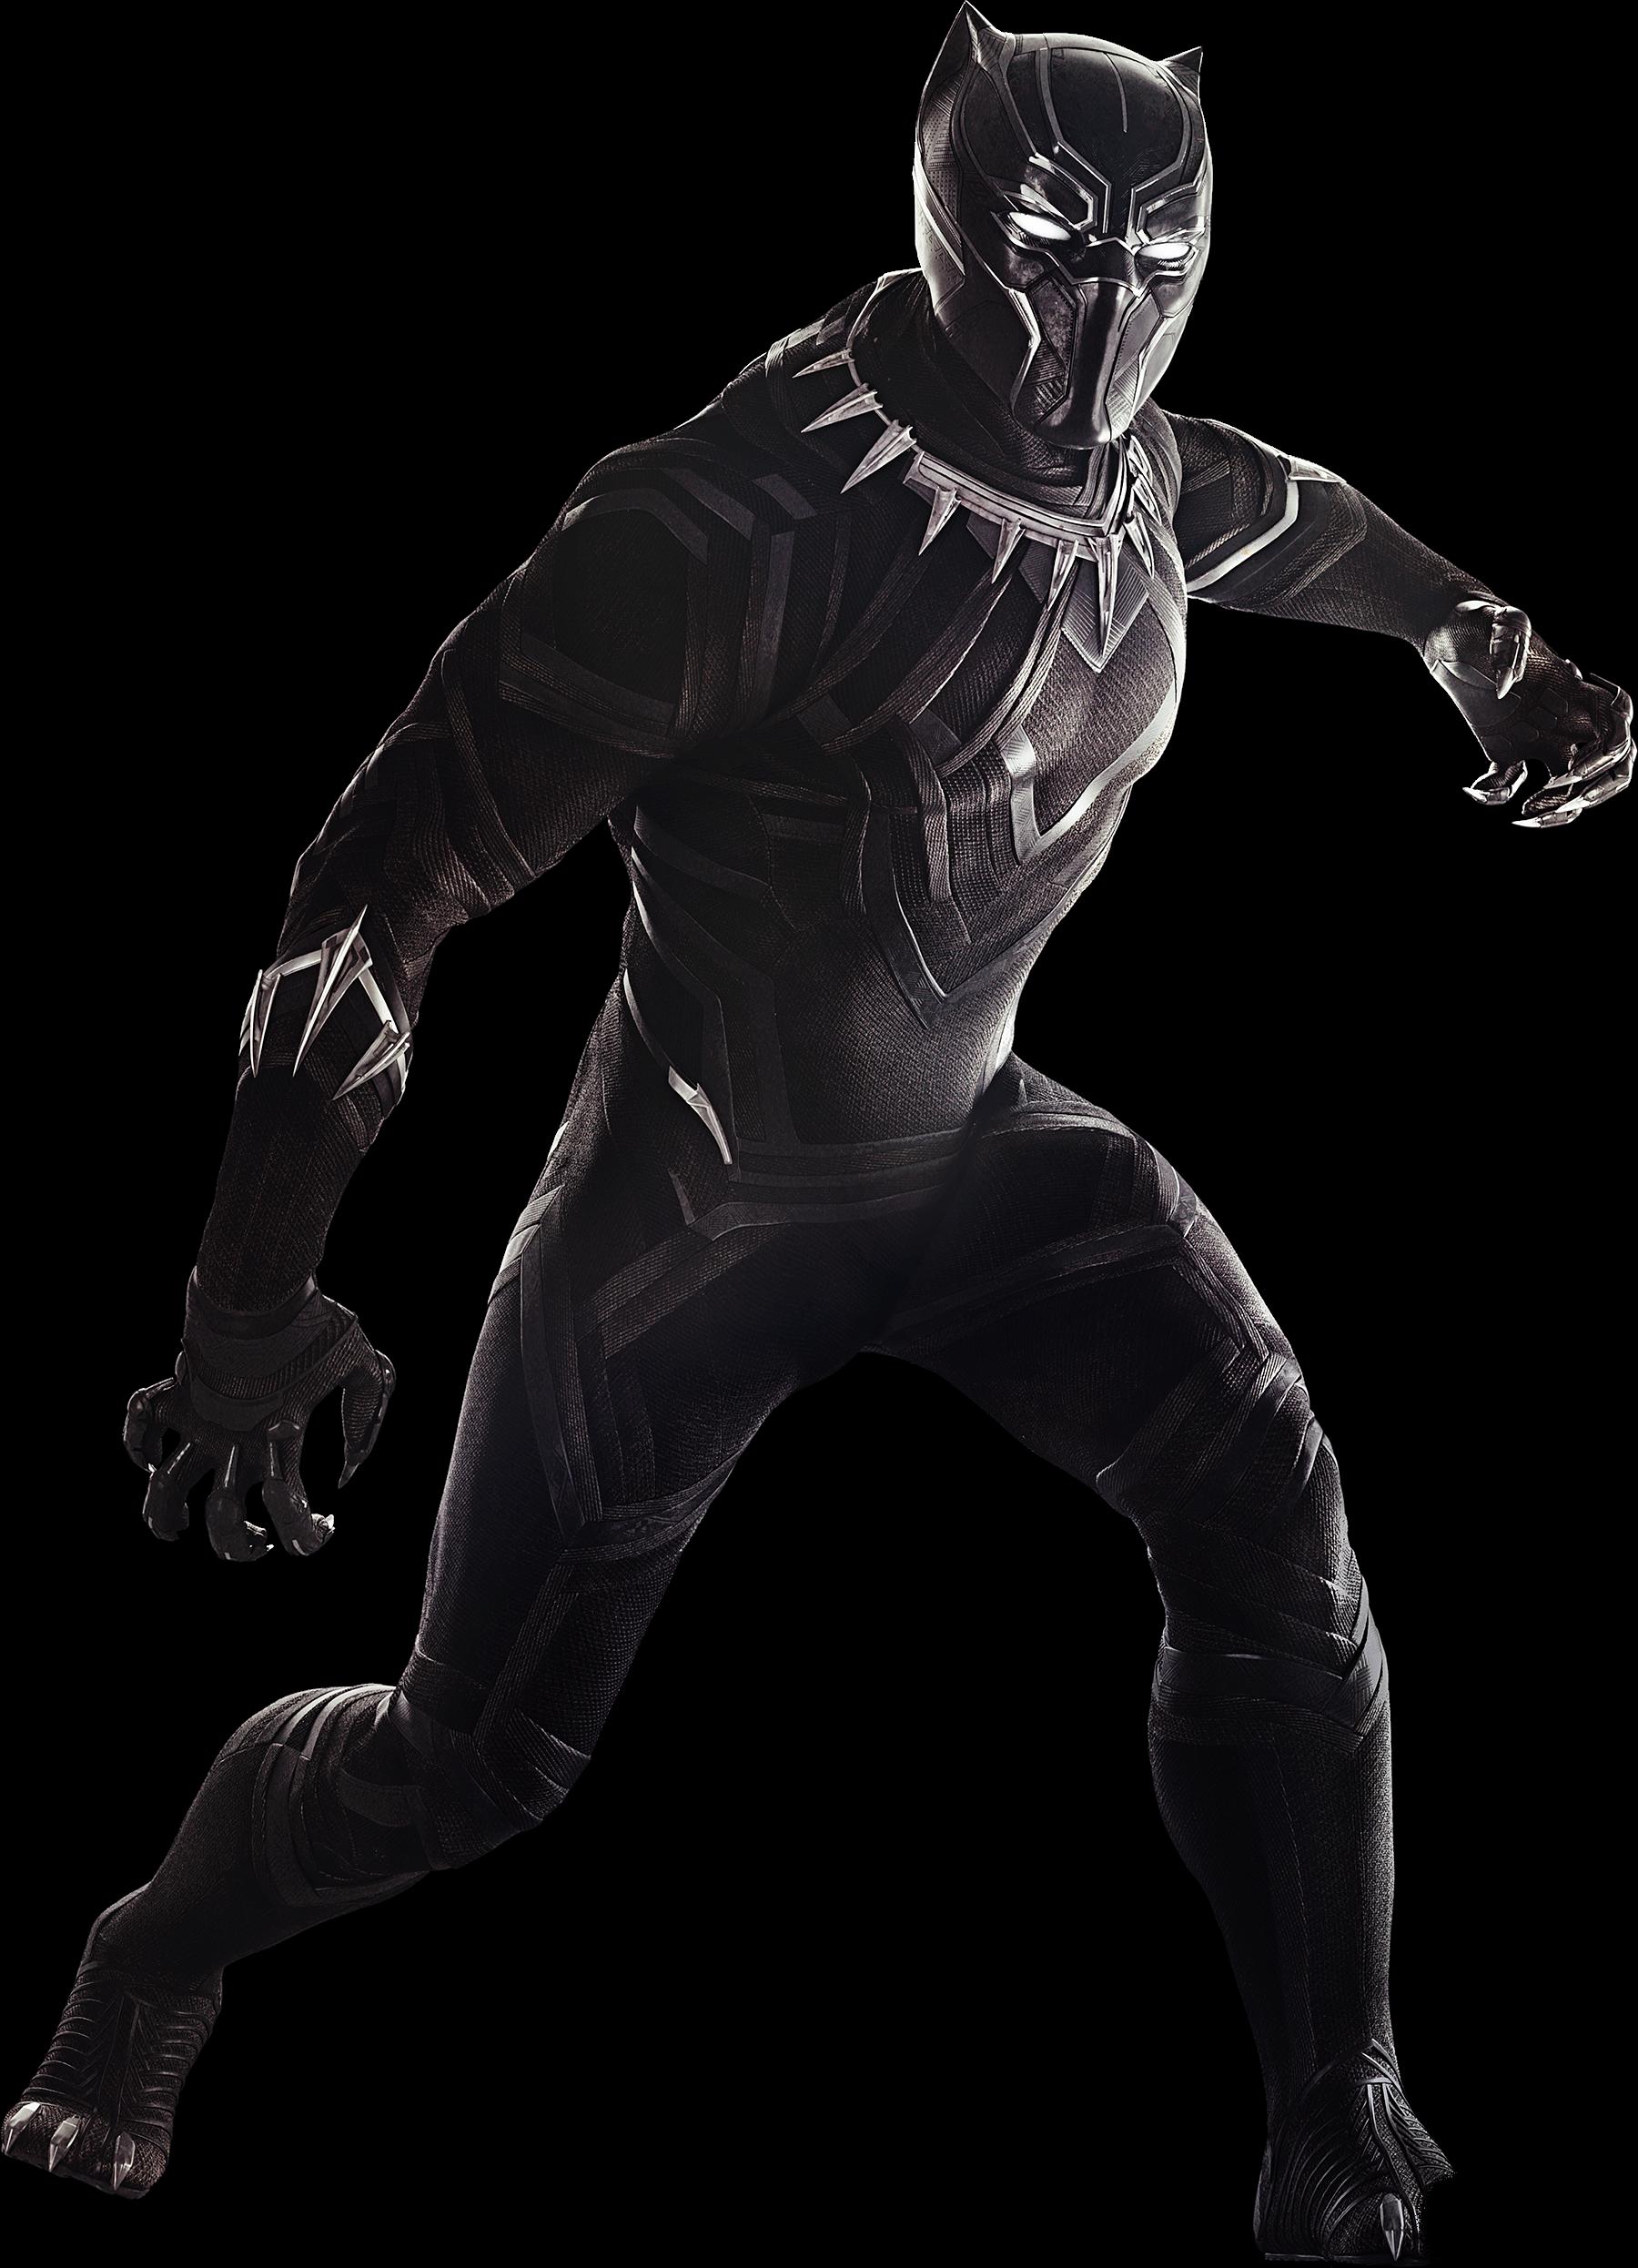 Black Panther Erik Killmonger Shuri T'Chaka.